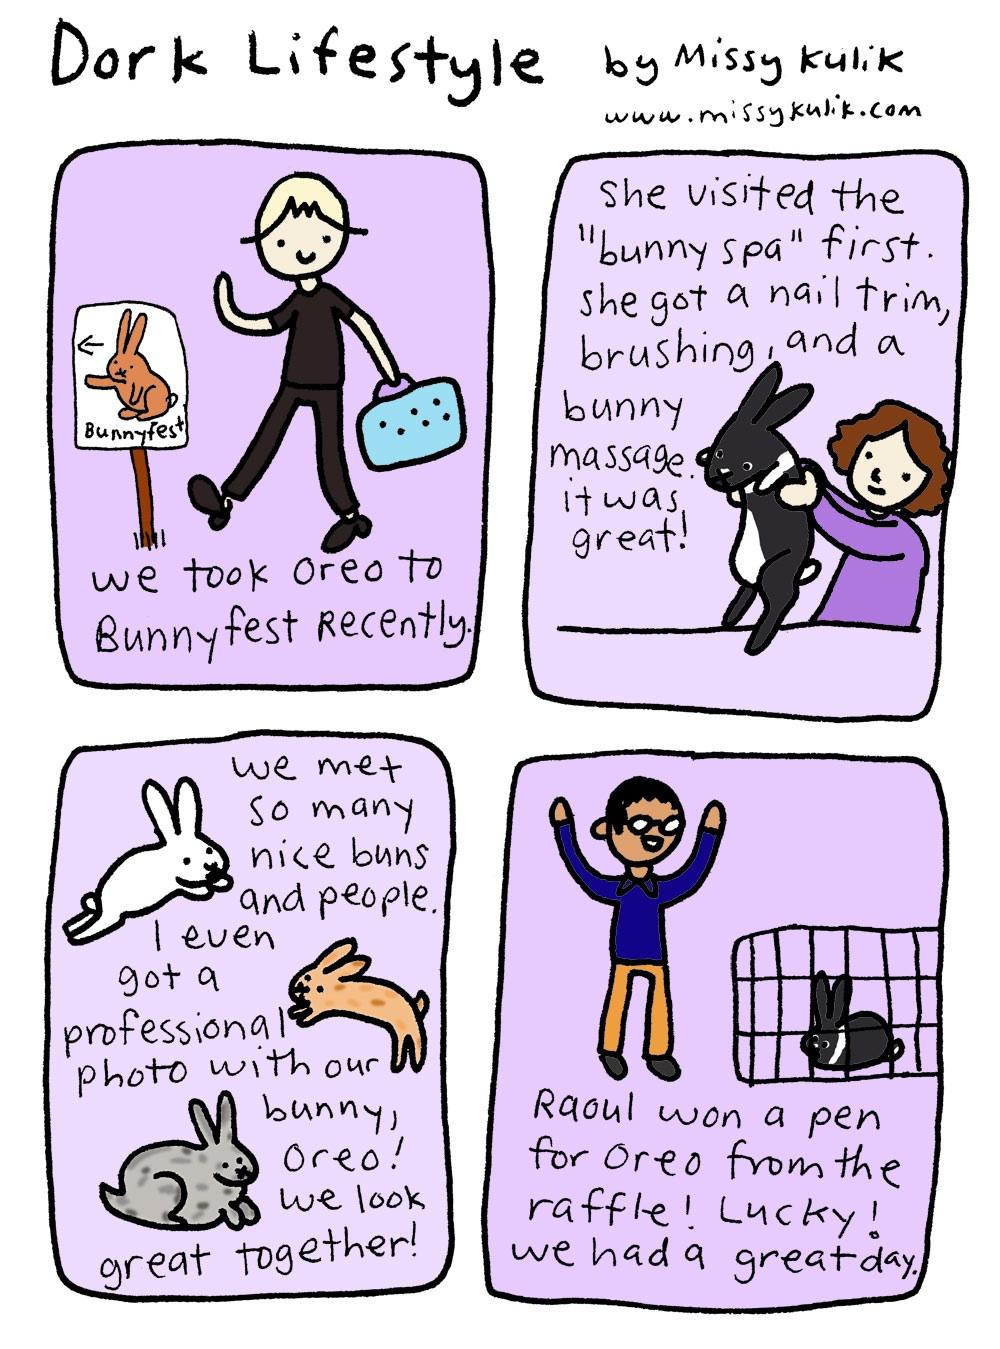 Dork Lifestyle: Bunnyfest